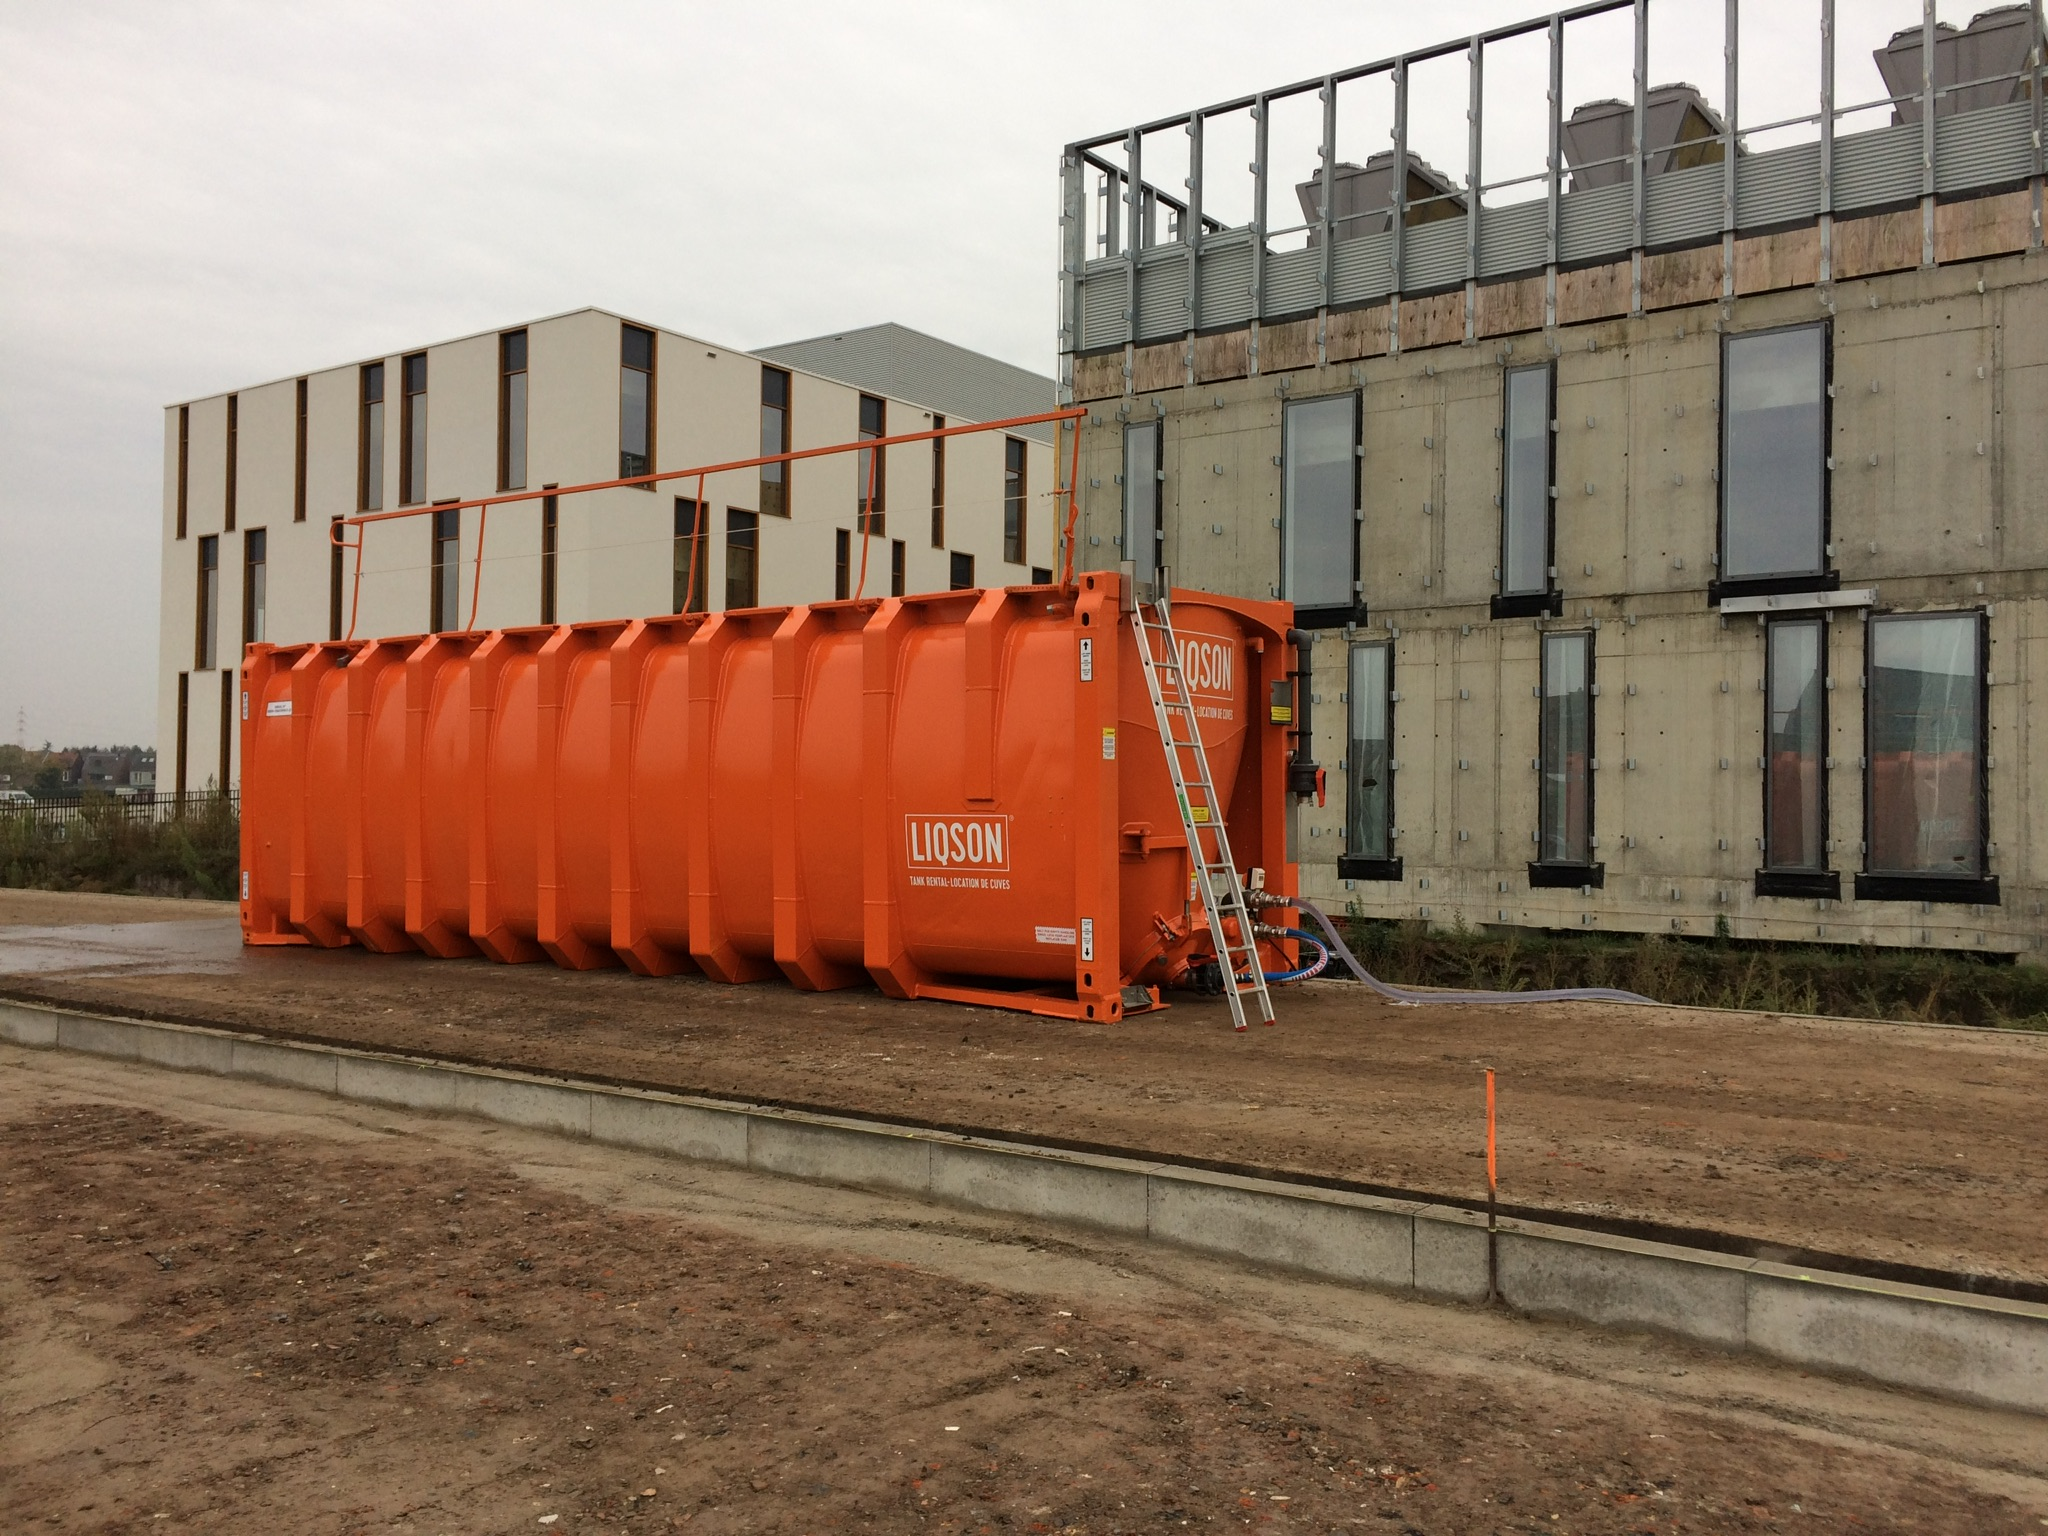 LIQSON rental tank